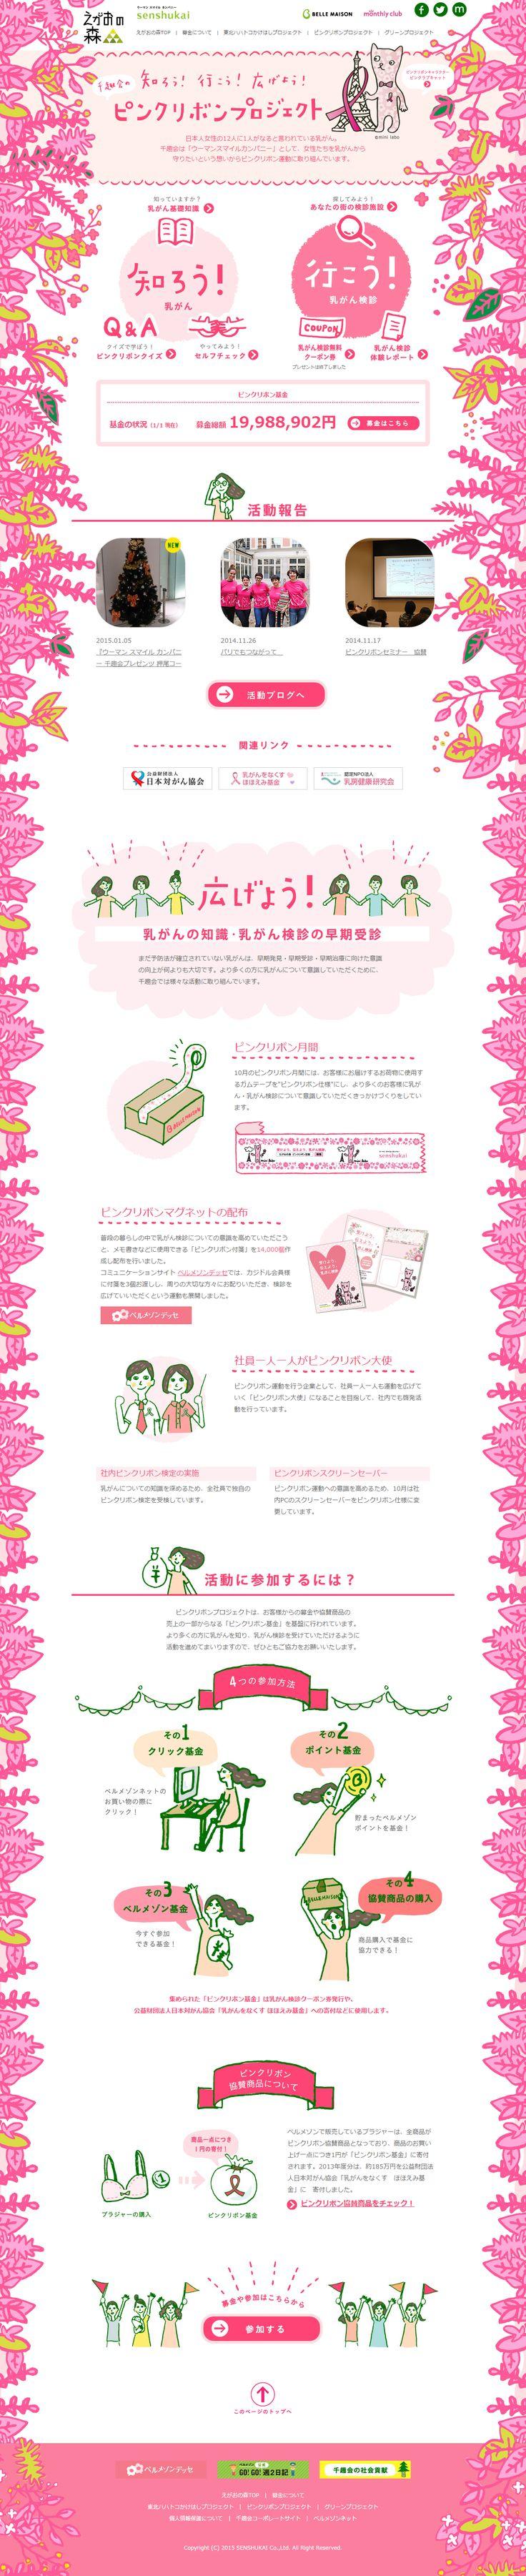 http://www.egaono-mori.jp/pink/index.html